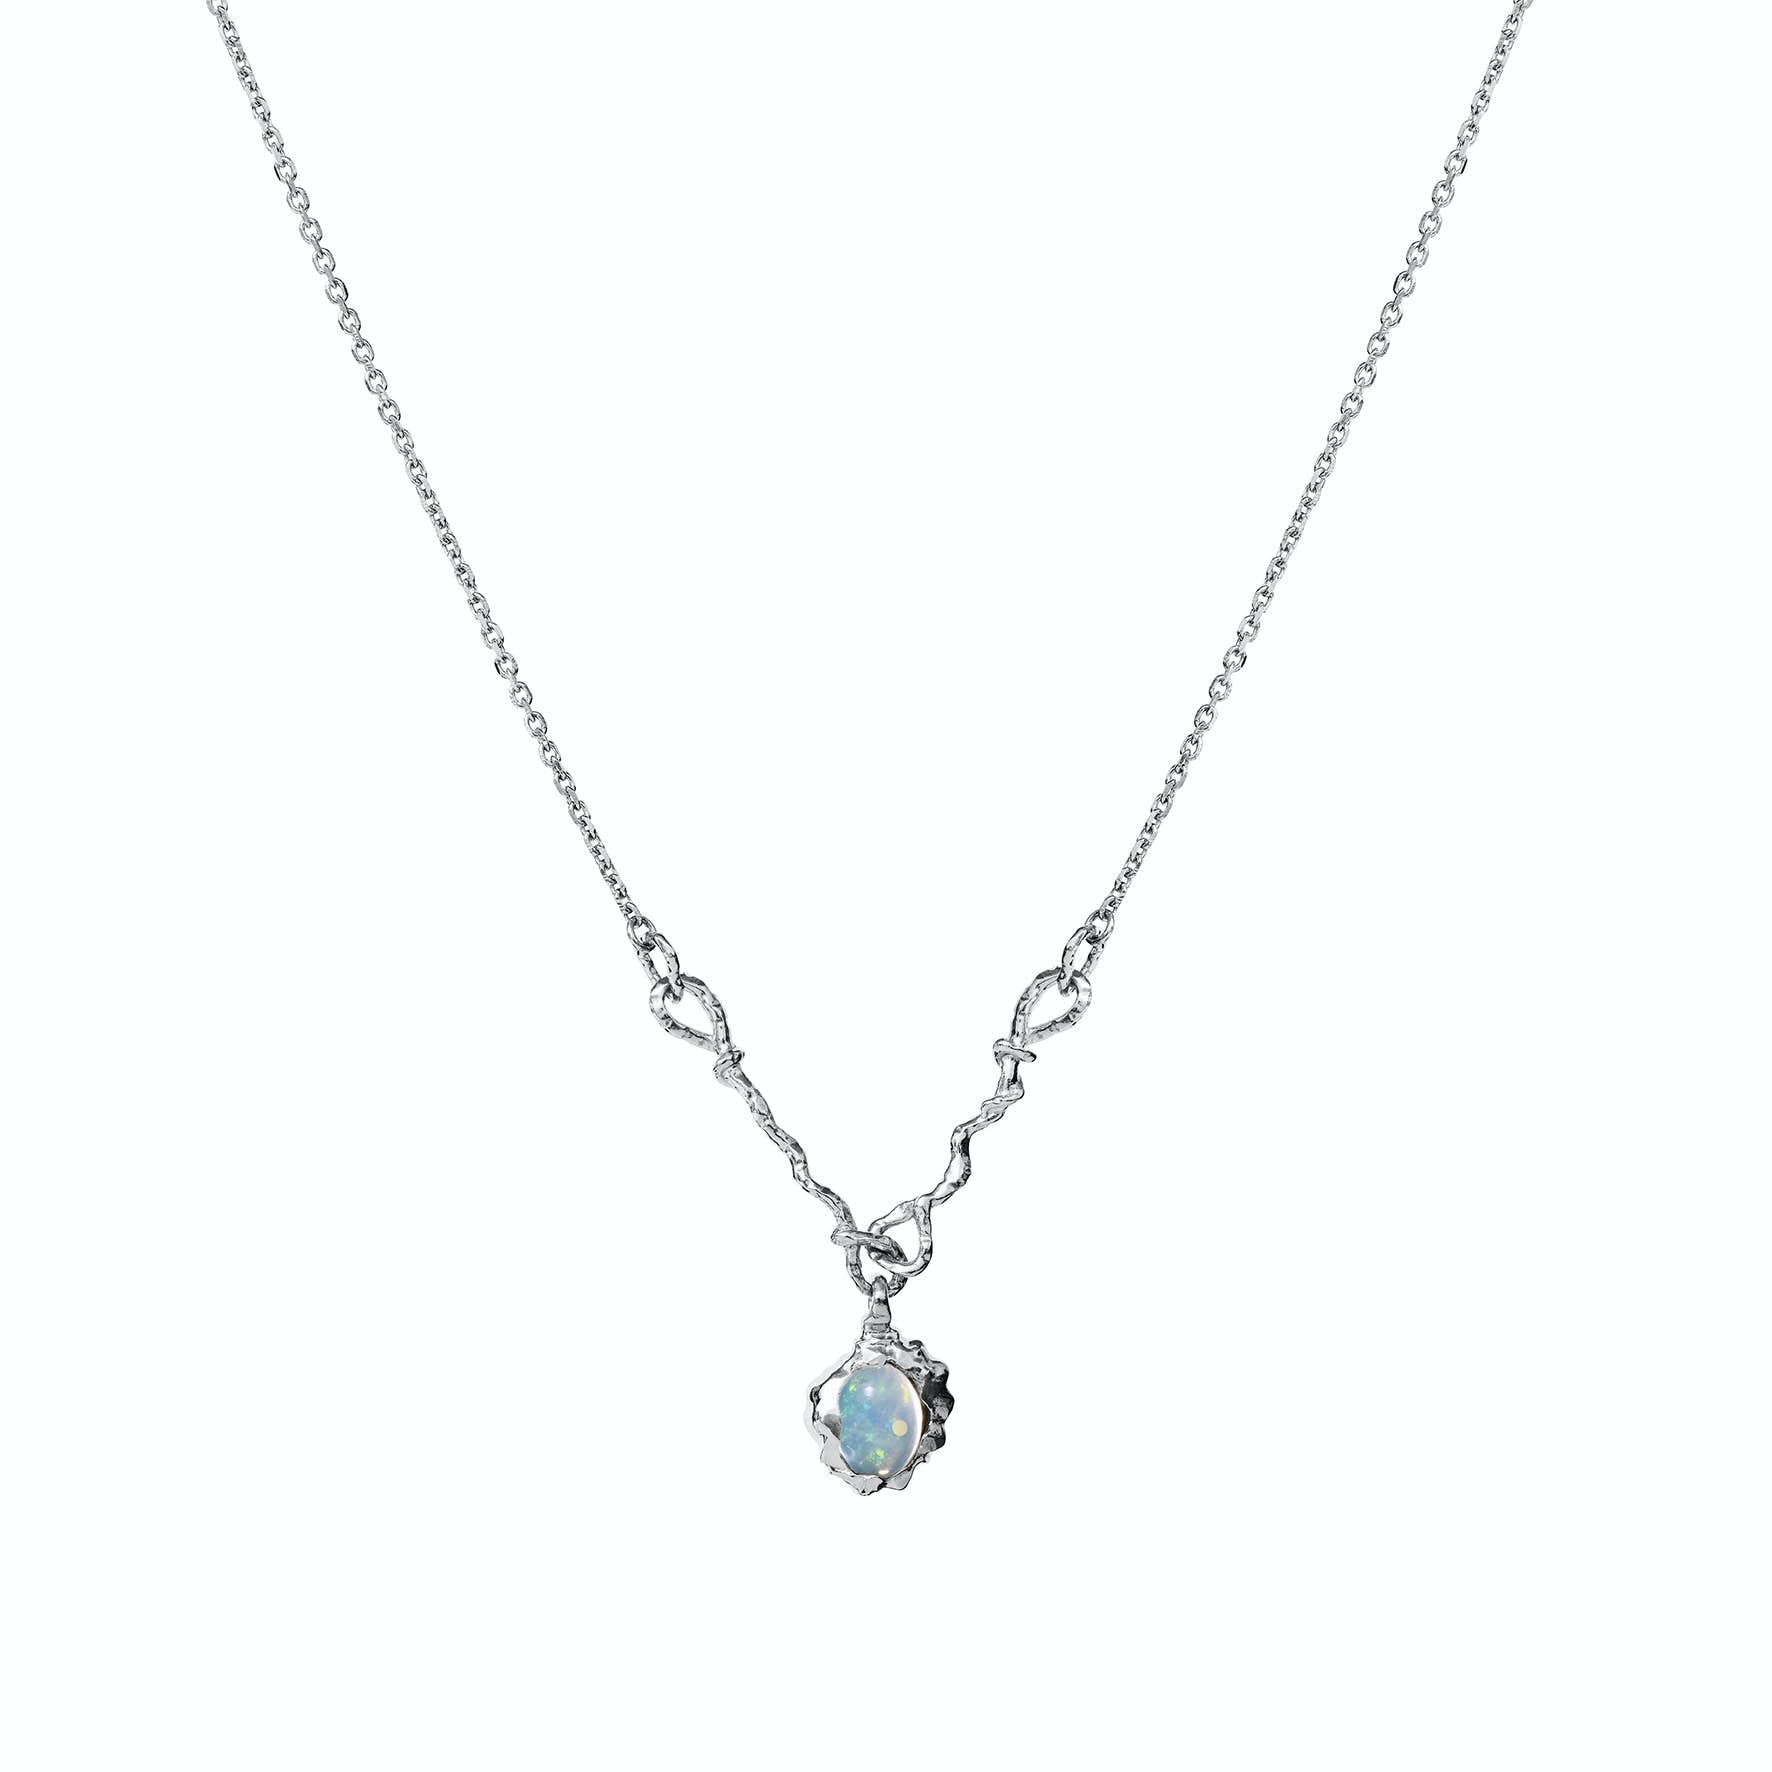 Phoenix Necklace from Maanesten in Silver Sterling 925